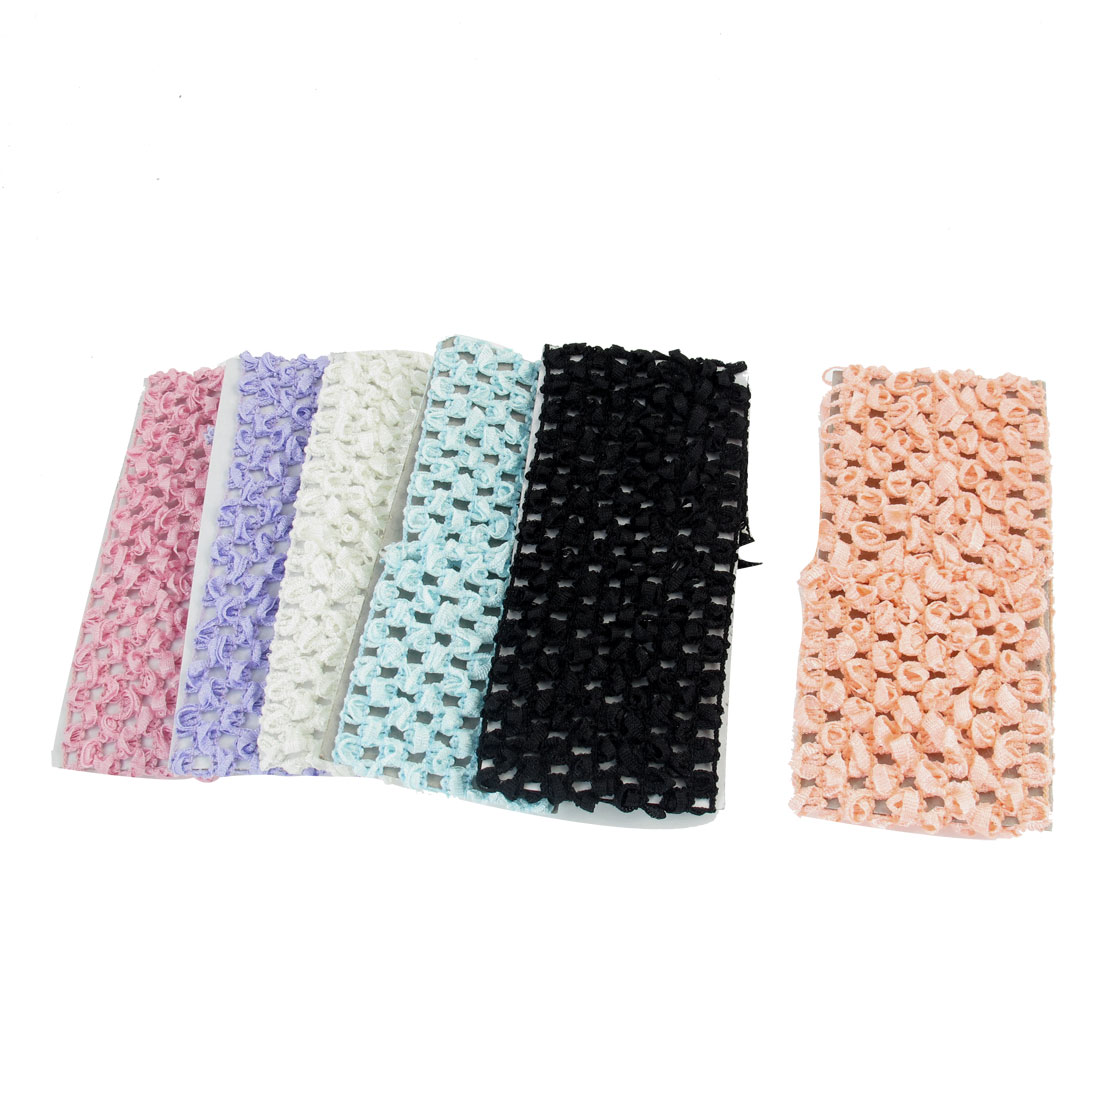 6 Pcs Multicolor Nylon Choth Bathing Face Washing Elastic Scarf Hair Band Tie